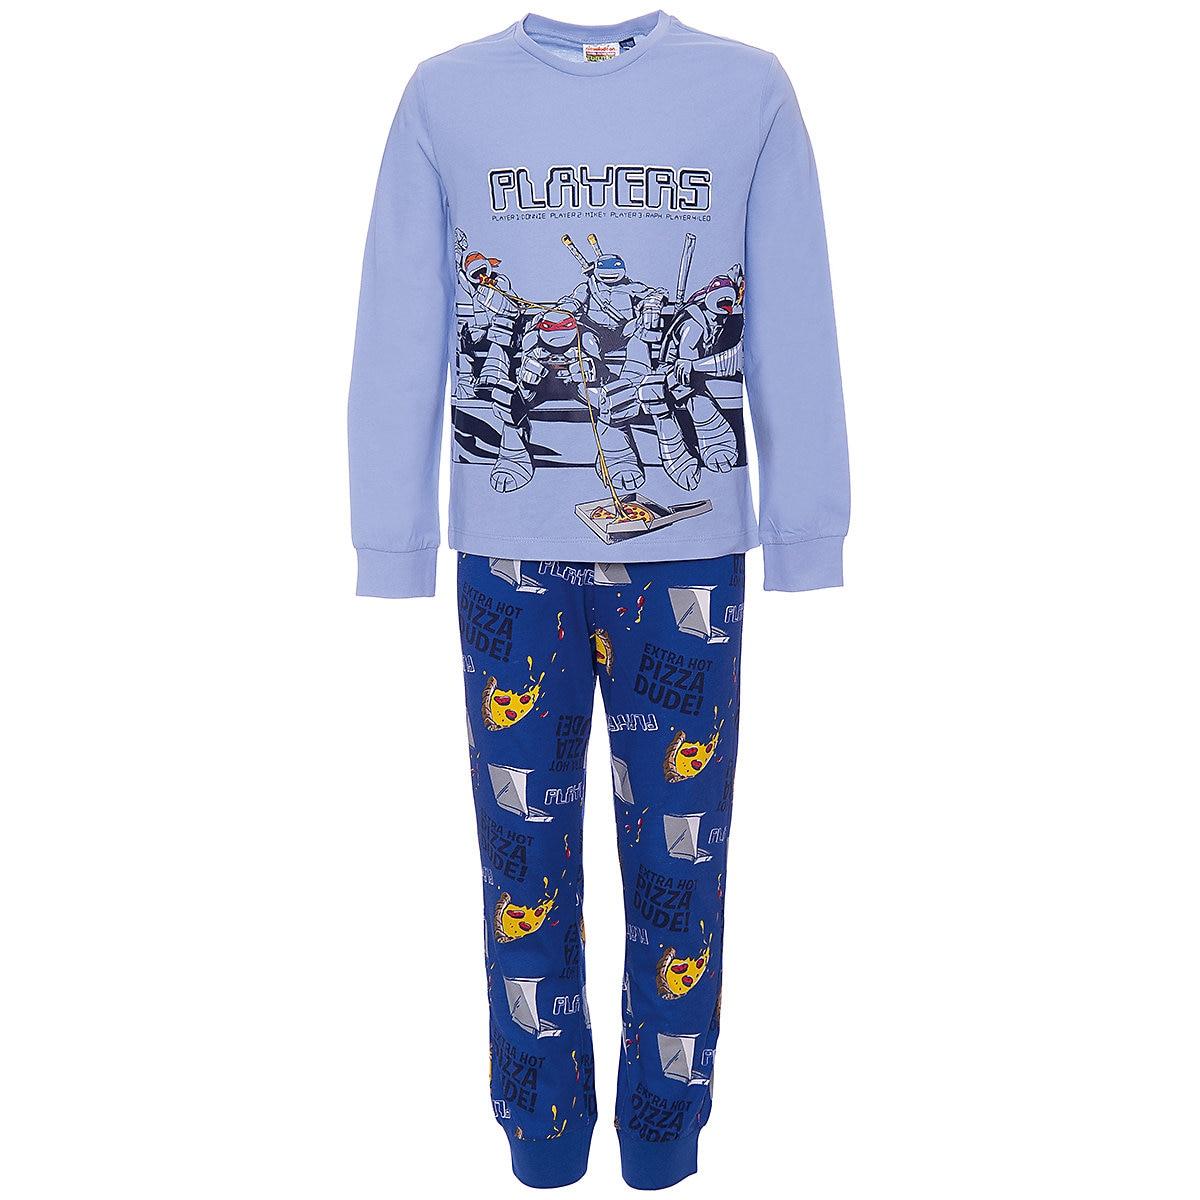 ORIGINAL MARINES Pajama Sets 9502040 Cotton Boys childrens clothing Sleepwear Robe parrot print cami pajama set with robe